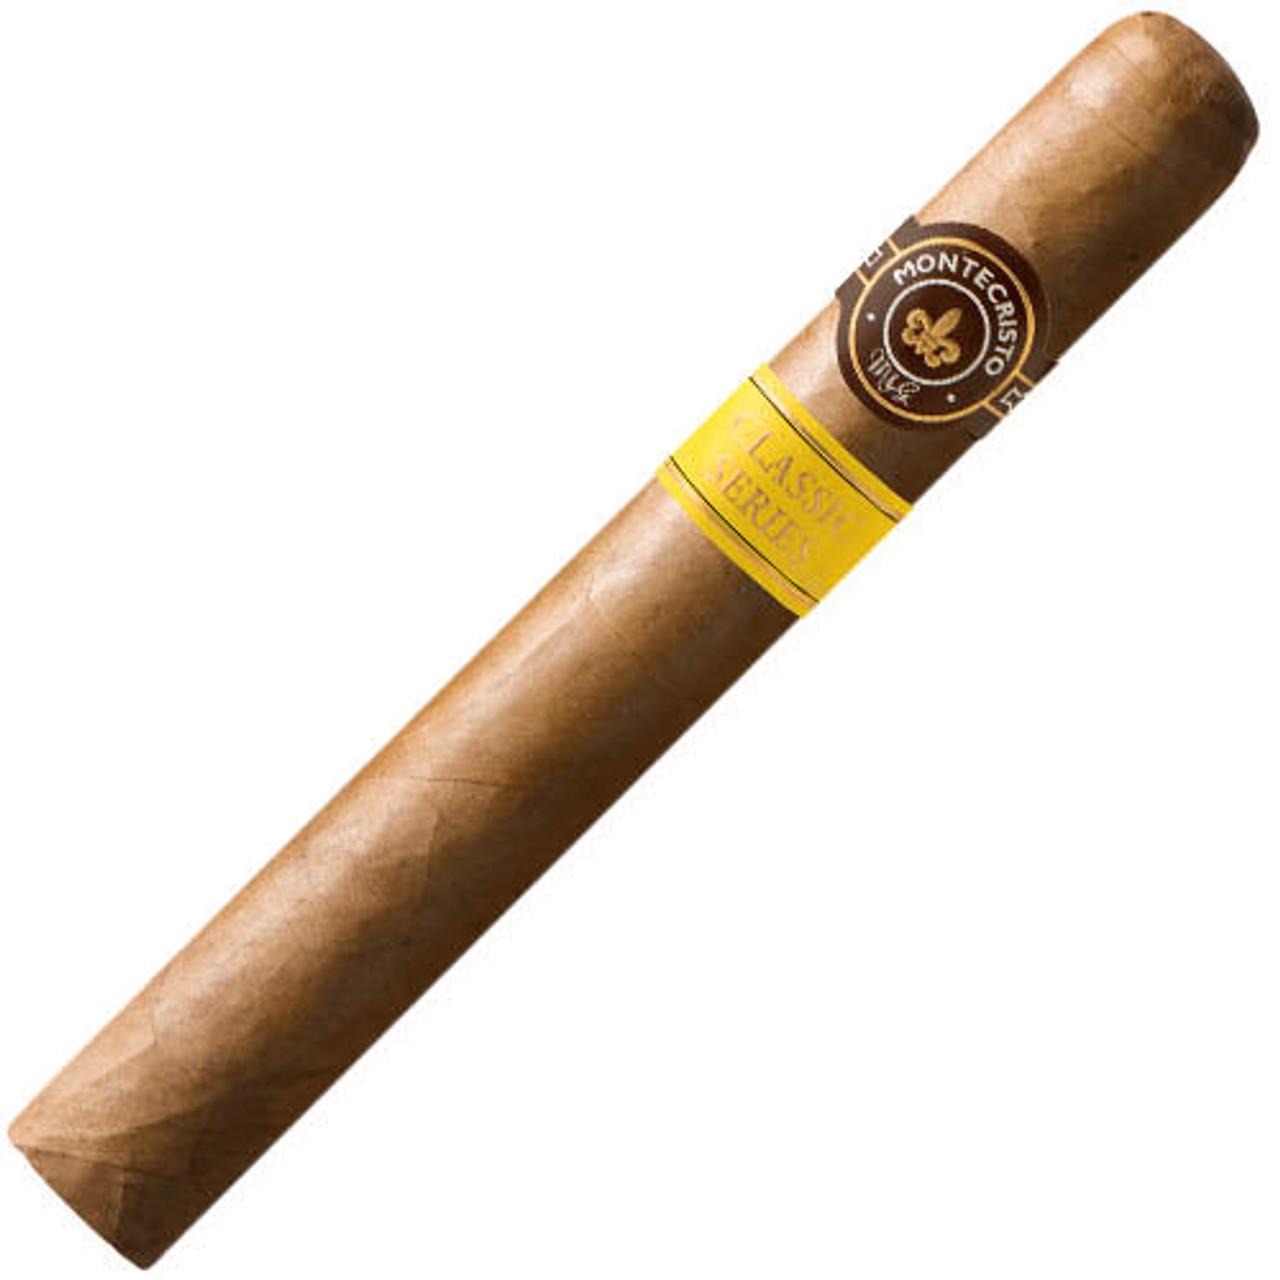 Montecristo Classic Toro Cigars - 6 x 52 (Pack of 5)